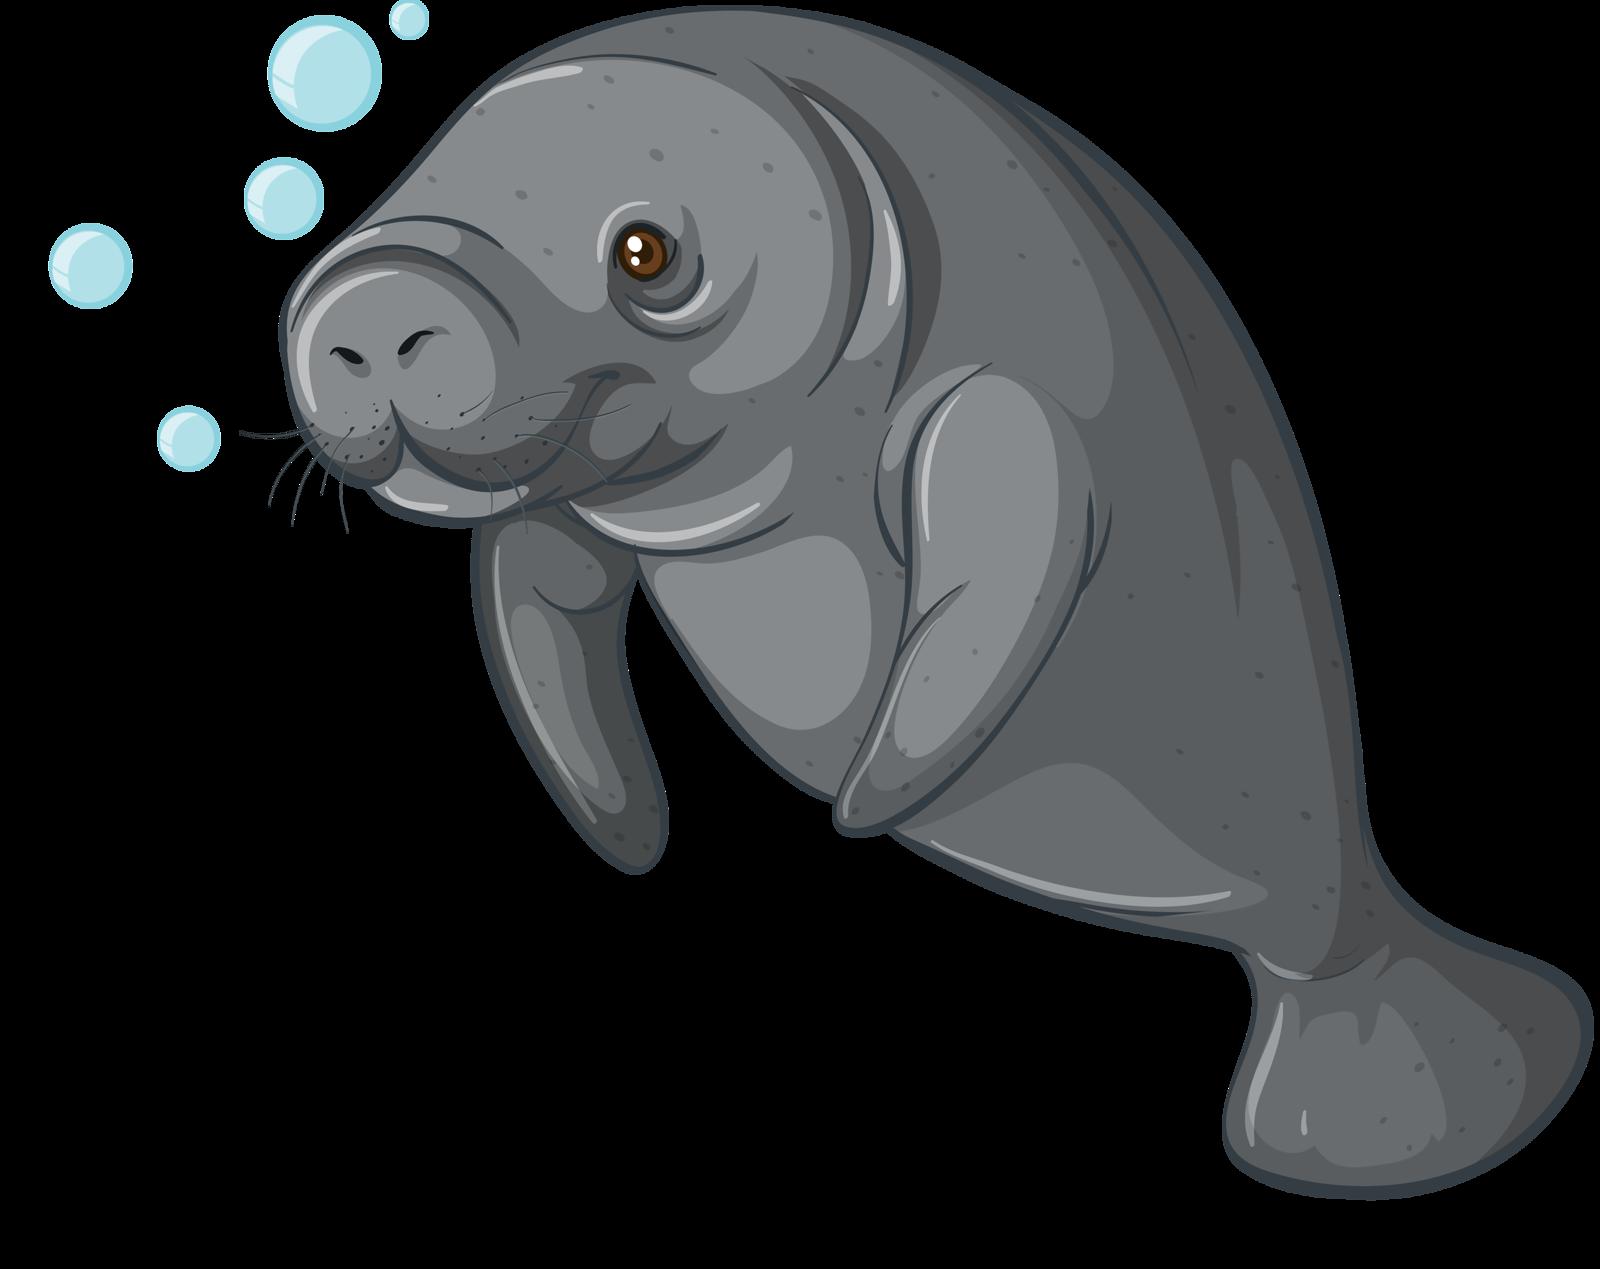 Walrus clipart transparent background sea creature.  png album